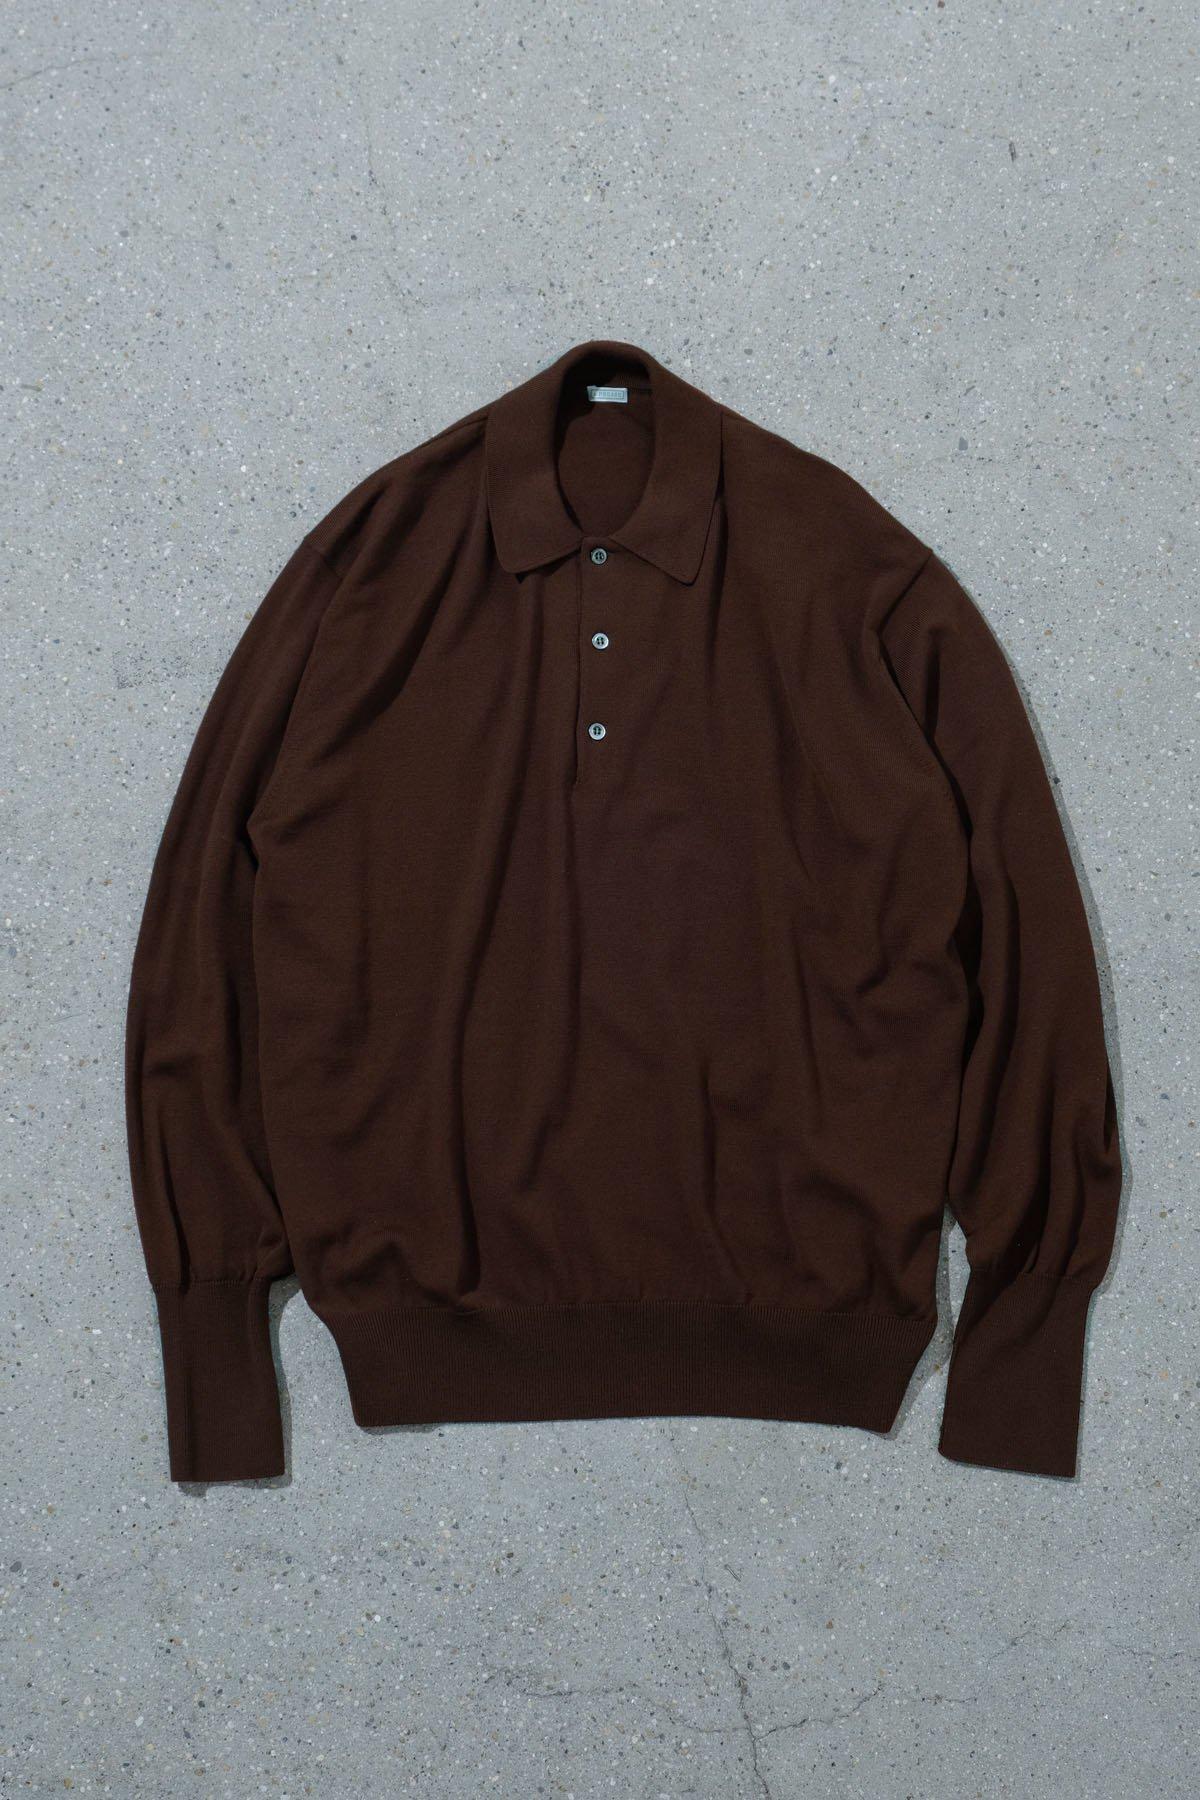 A.PRESSE / LONG SLEEVE Knit Polo Shirt